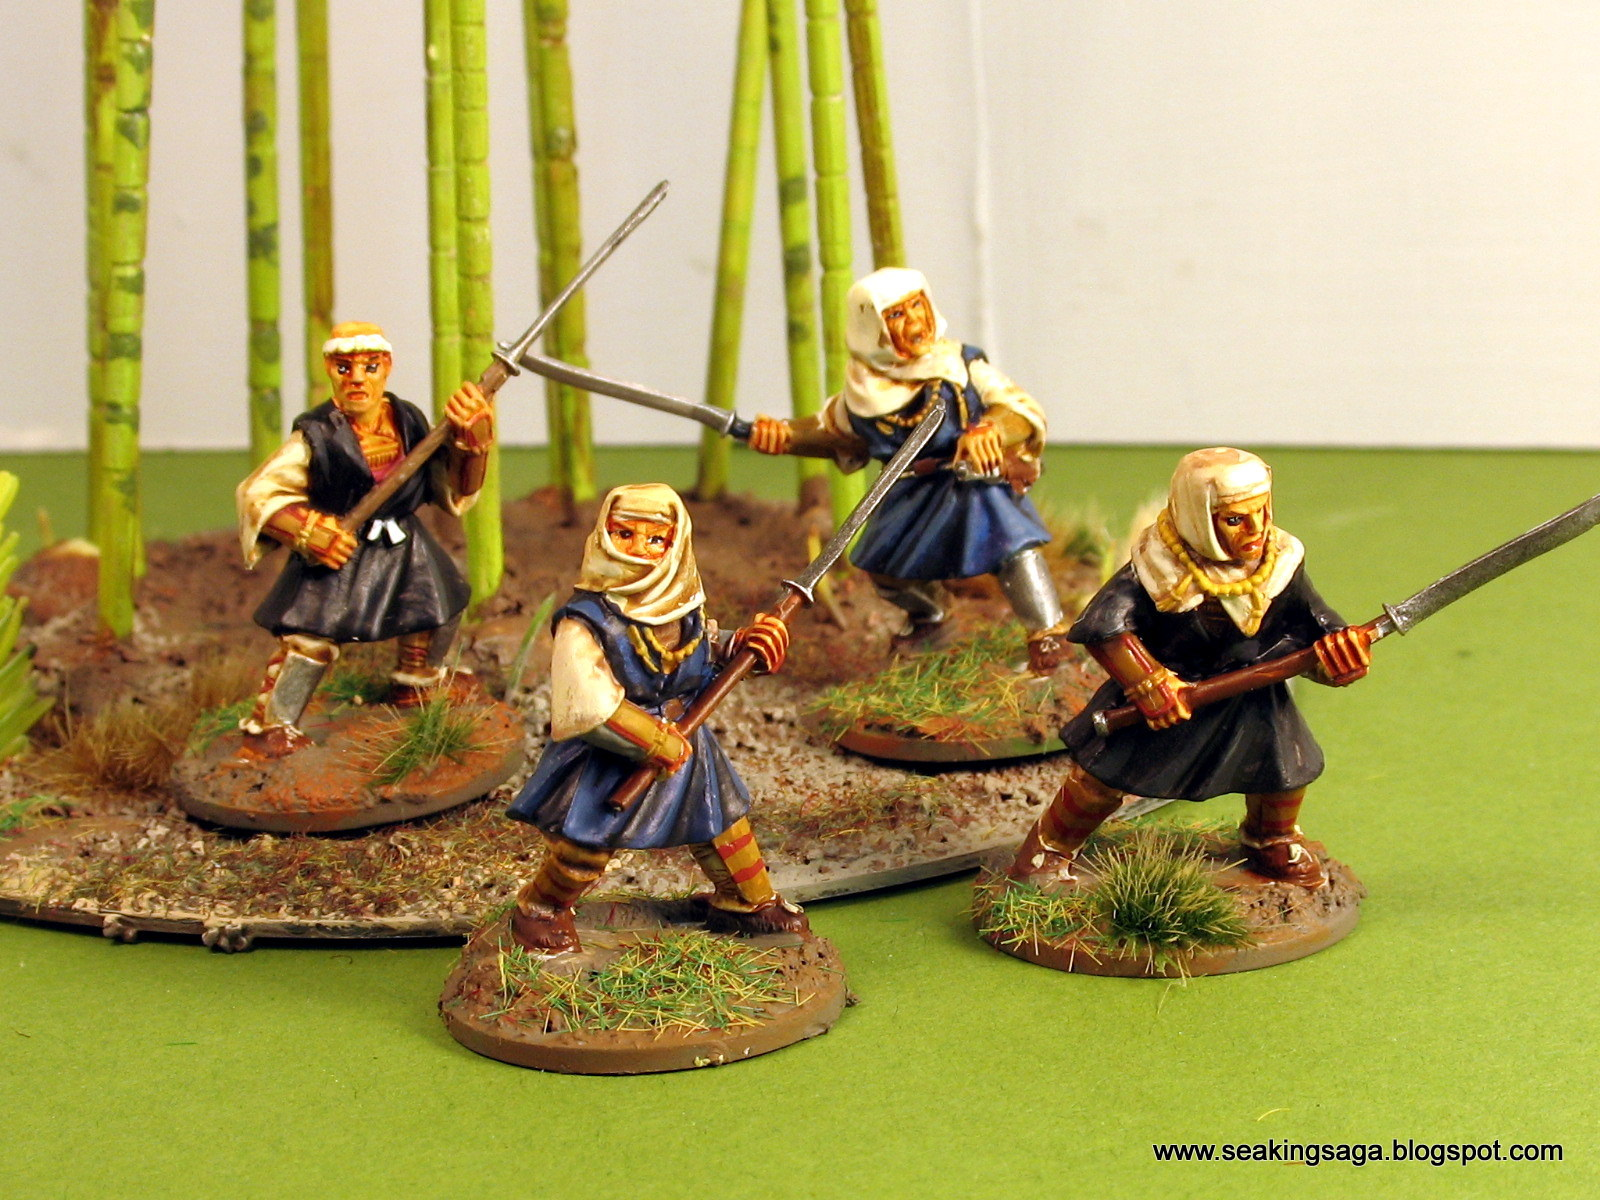 Ronin01 - Sohei Monk Buntai - North Star Military Figures